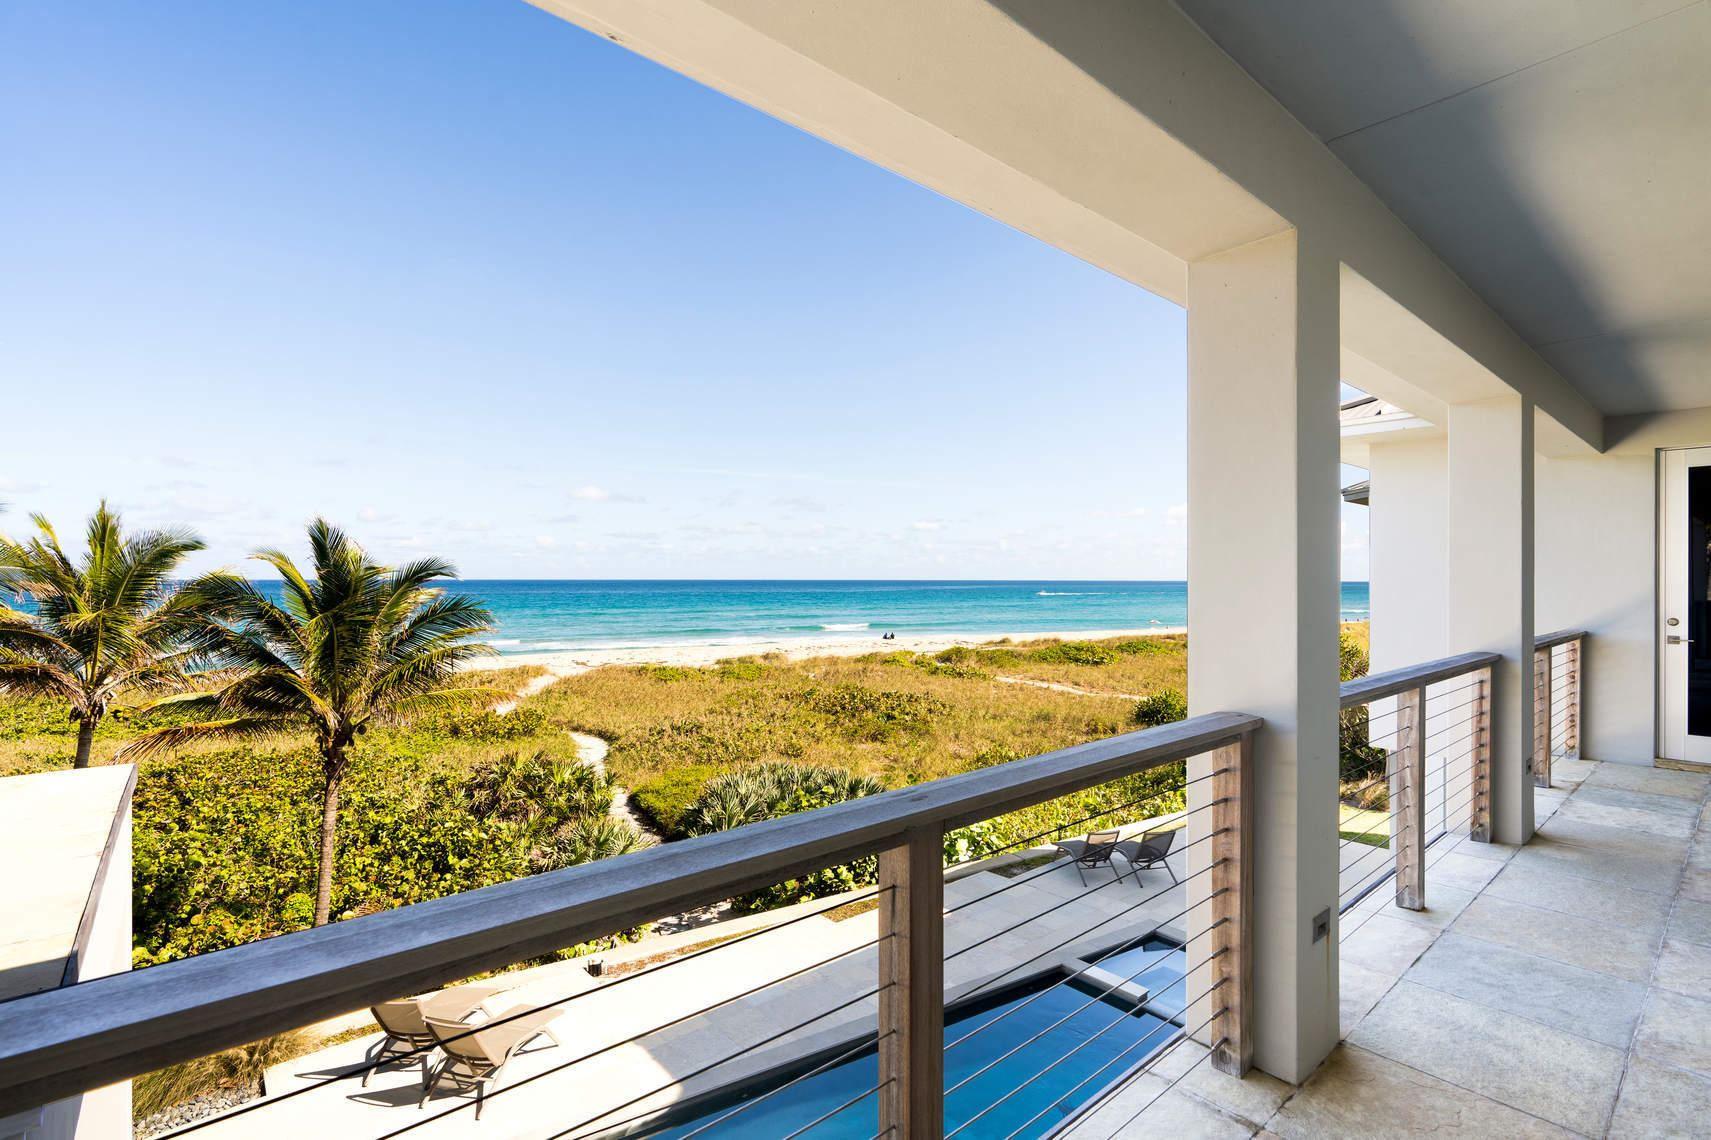 711 N Ocean Boulevard, Delray Beach, FL 33483 - #: RX-10611037